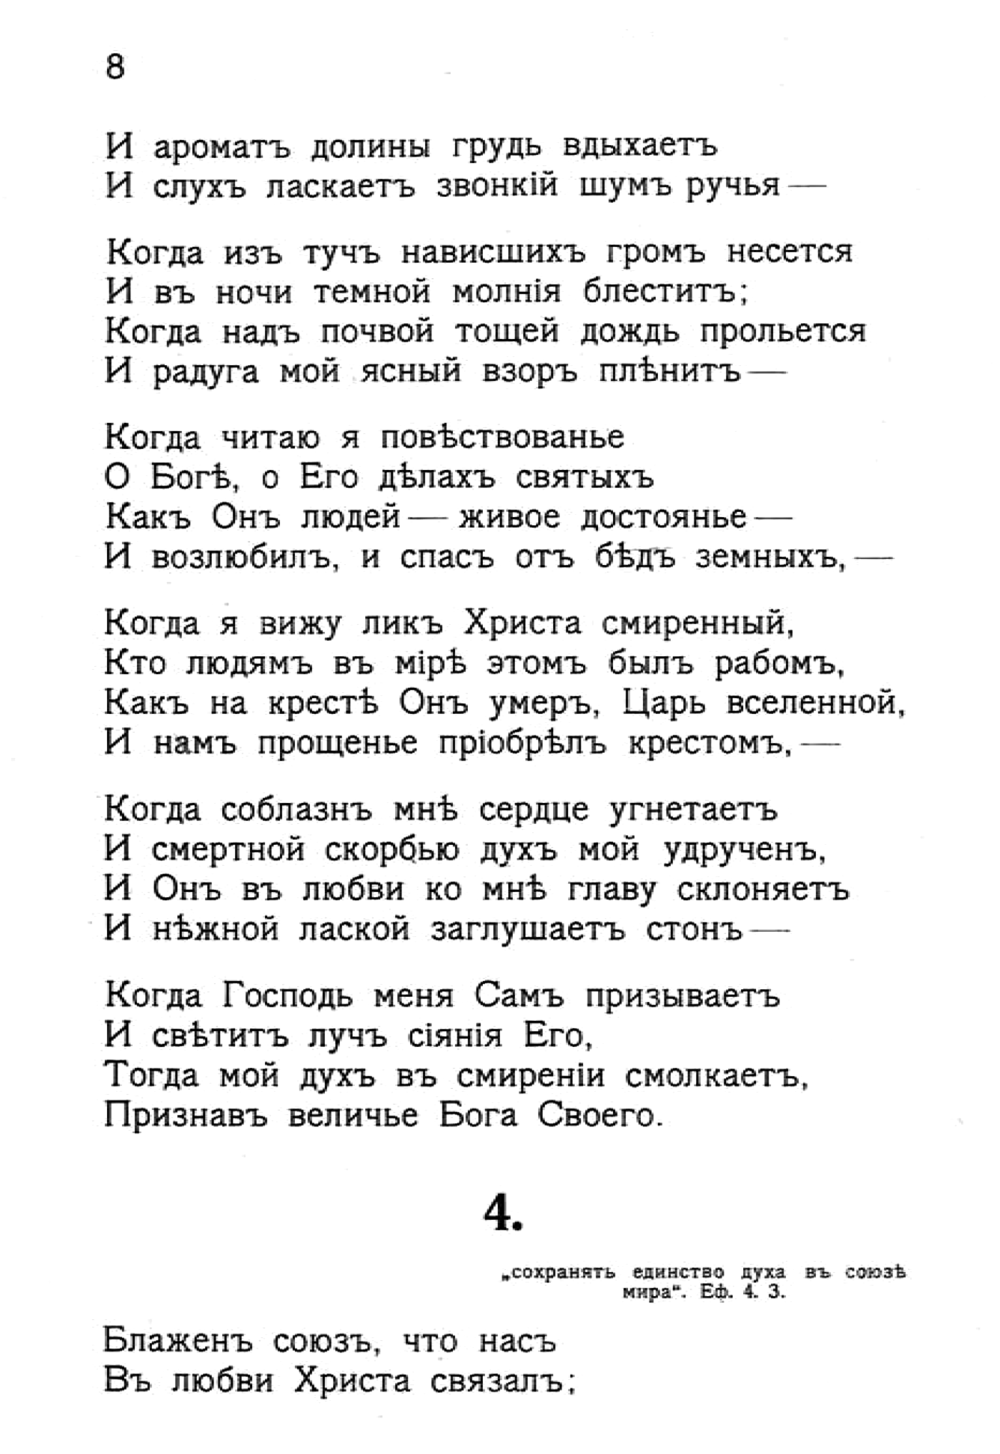 801_r-1_Prokhanov1908-3.png